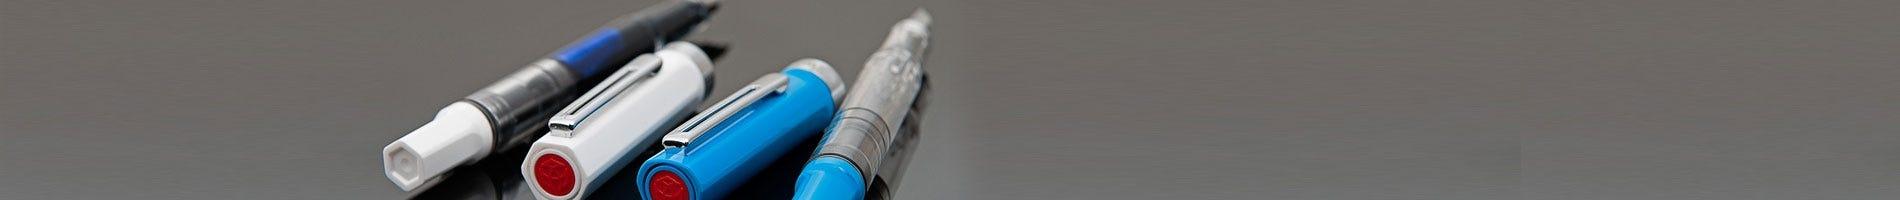 twsbi refillable ink fountain pen